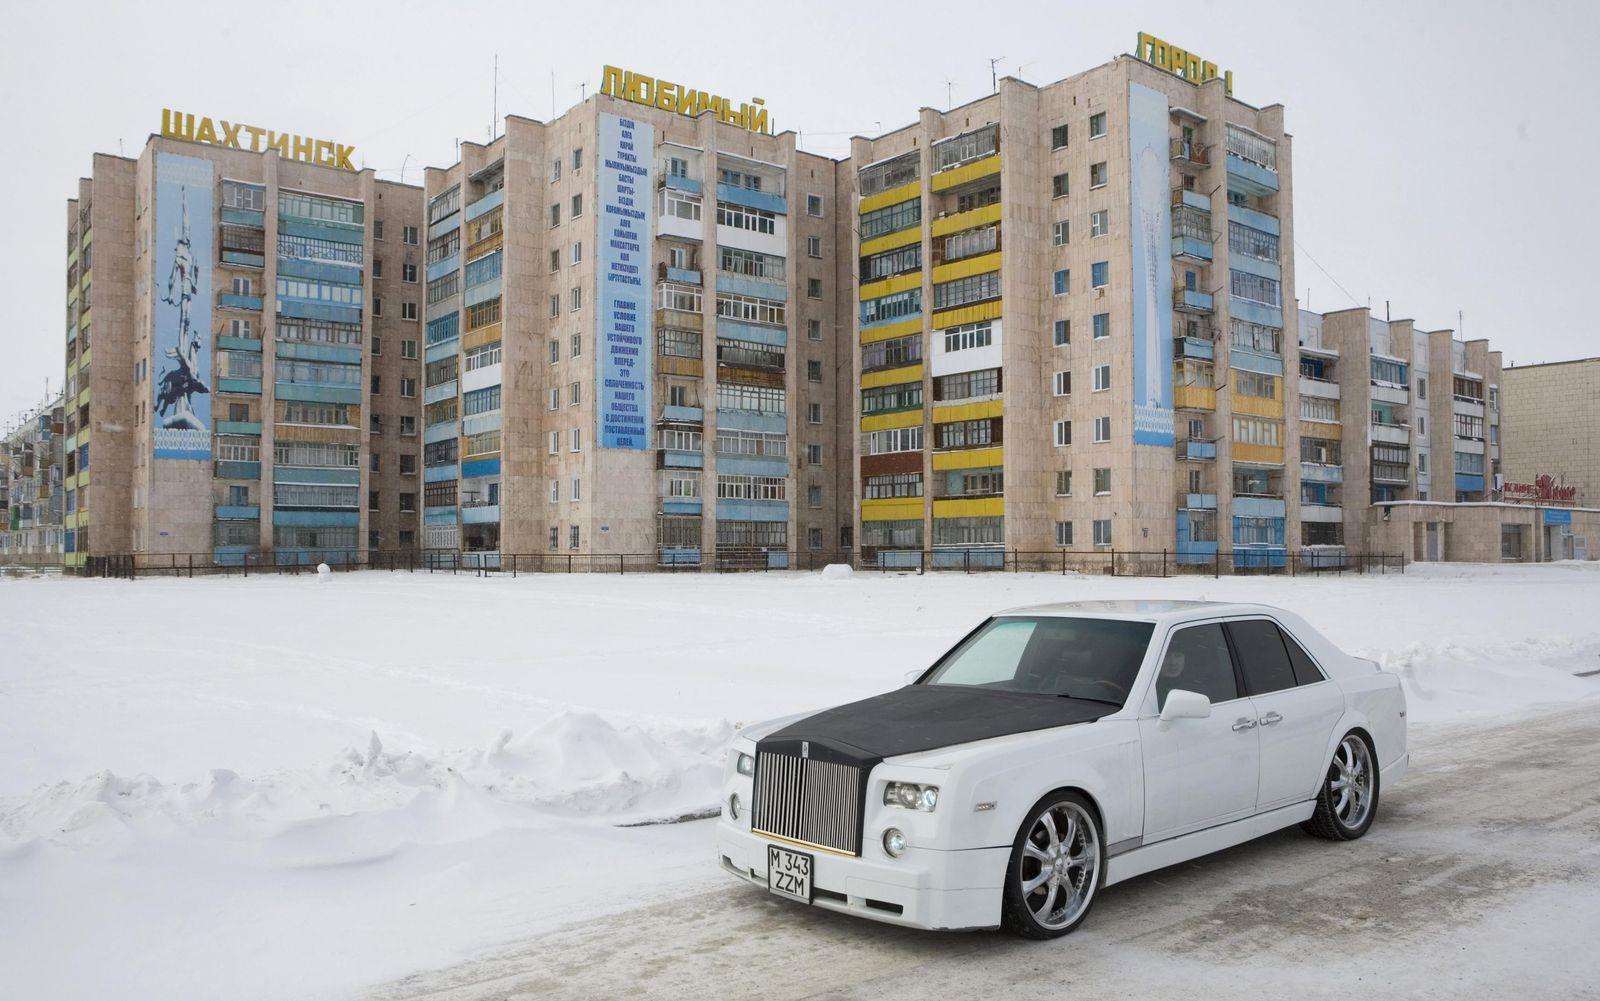 Rolls Royce / Replikat / Abefahren